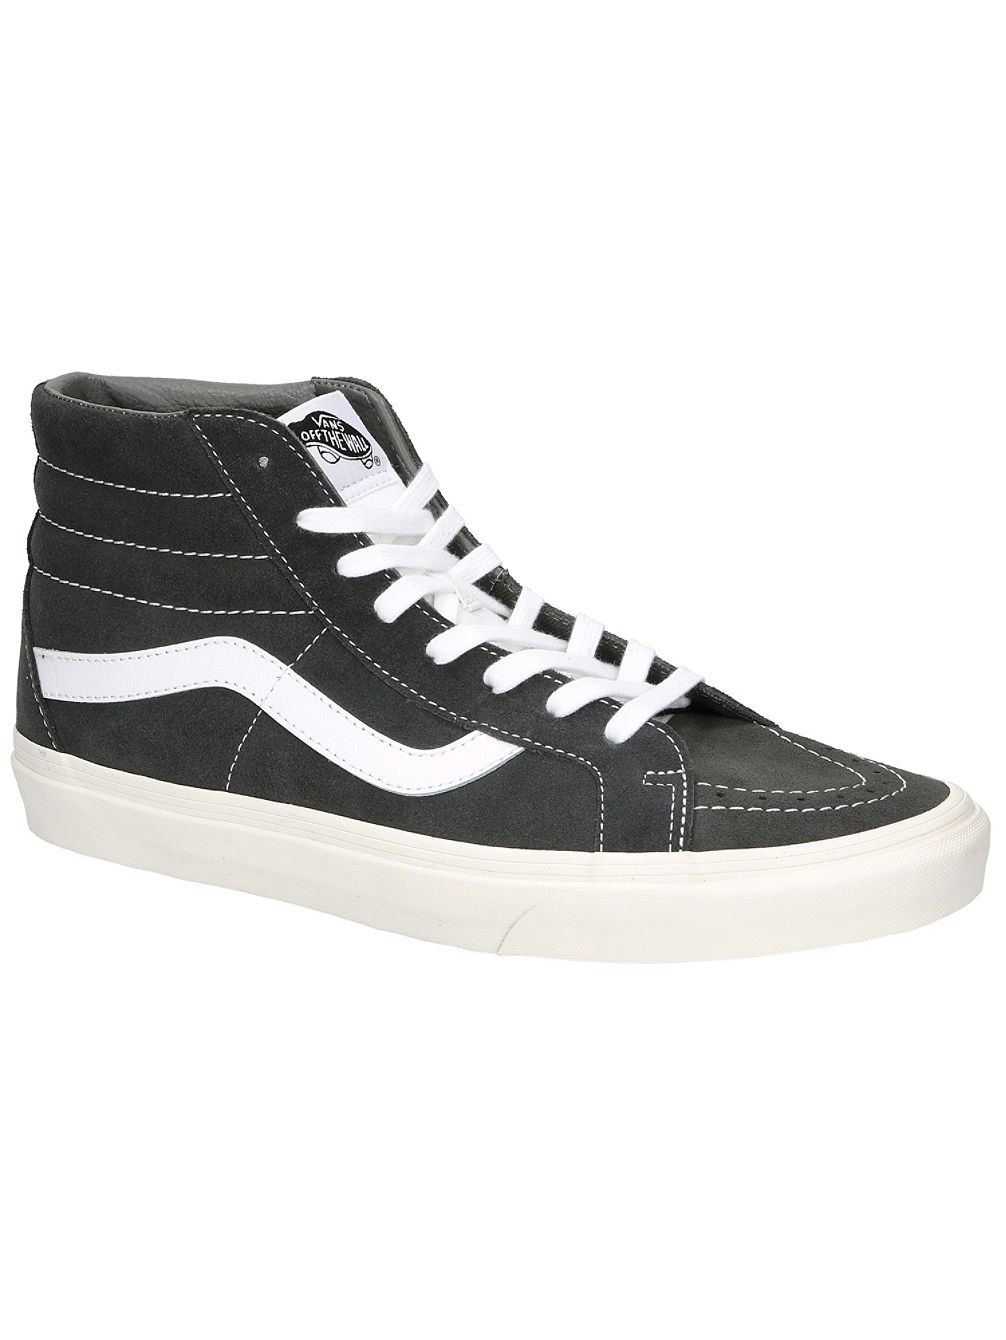 4c0677667ea130 Buy Vans Sk8-Hi Reissue Sneakers online at blue-tomato.com